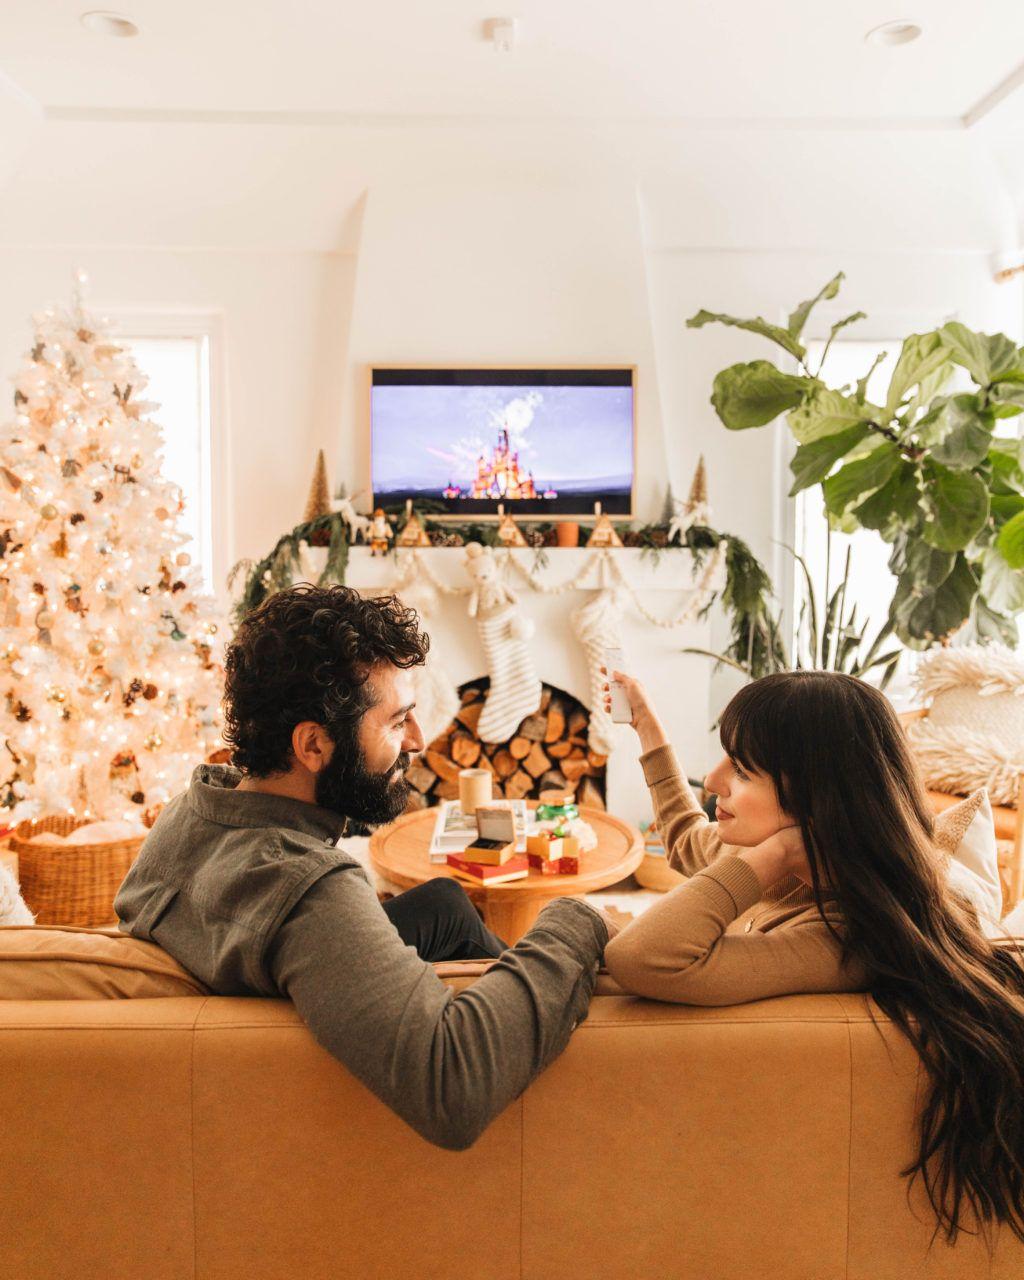 Date Night with Disney | Disney plus, Original parent trap, Holiday dates